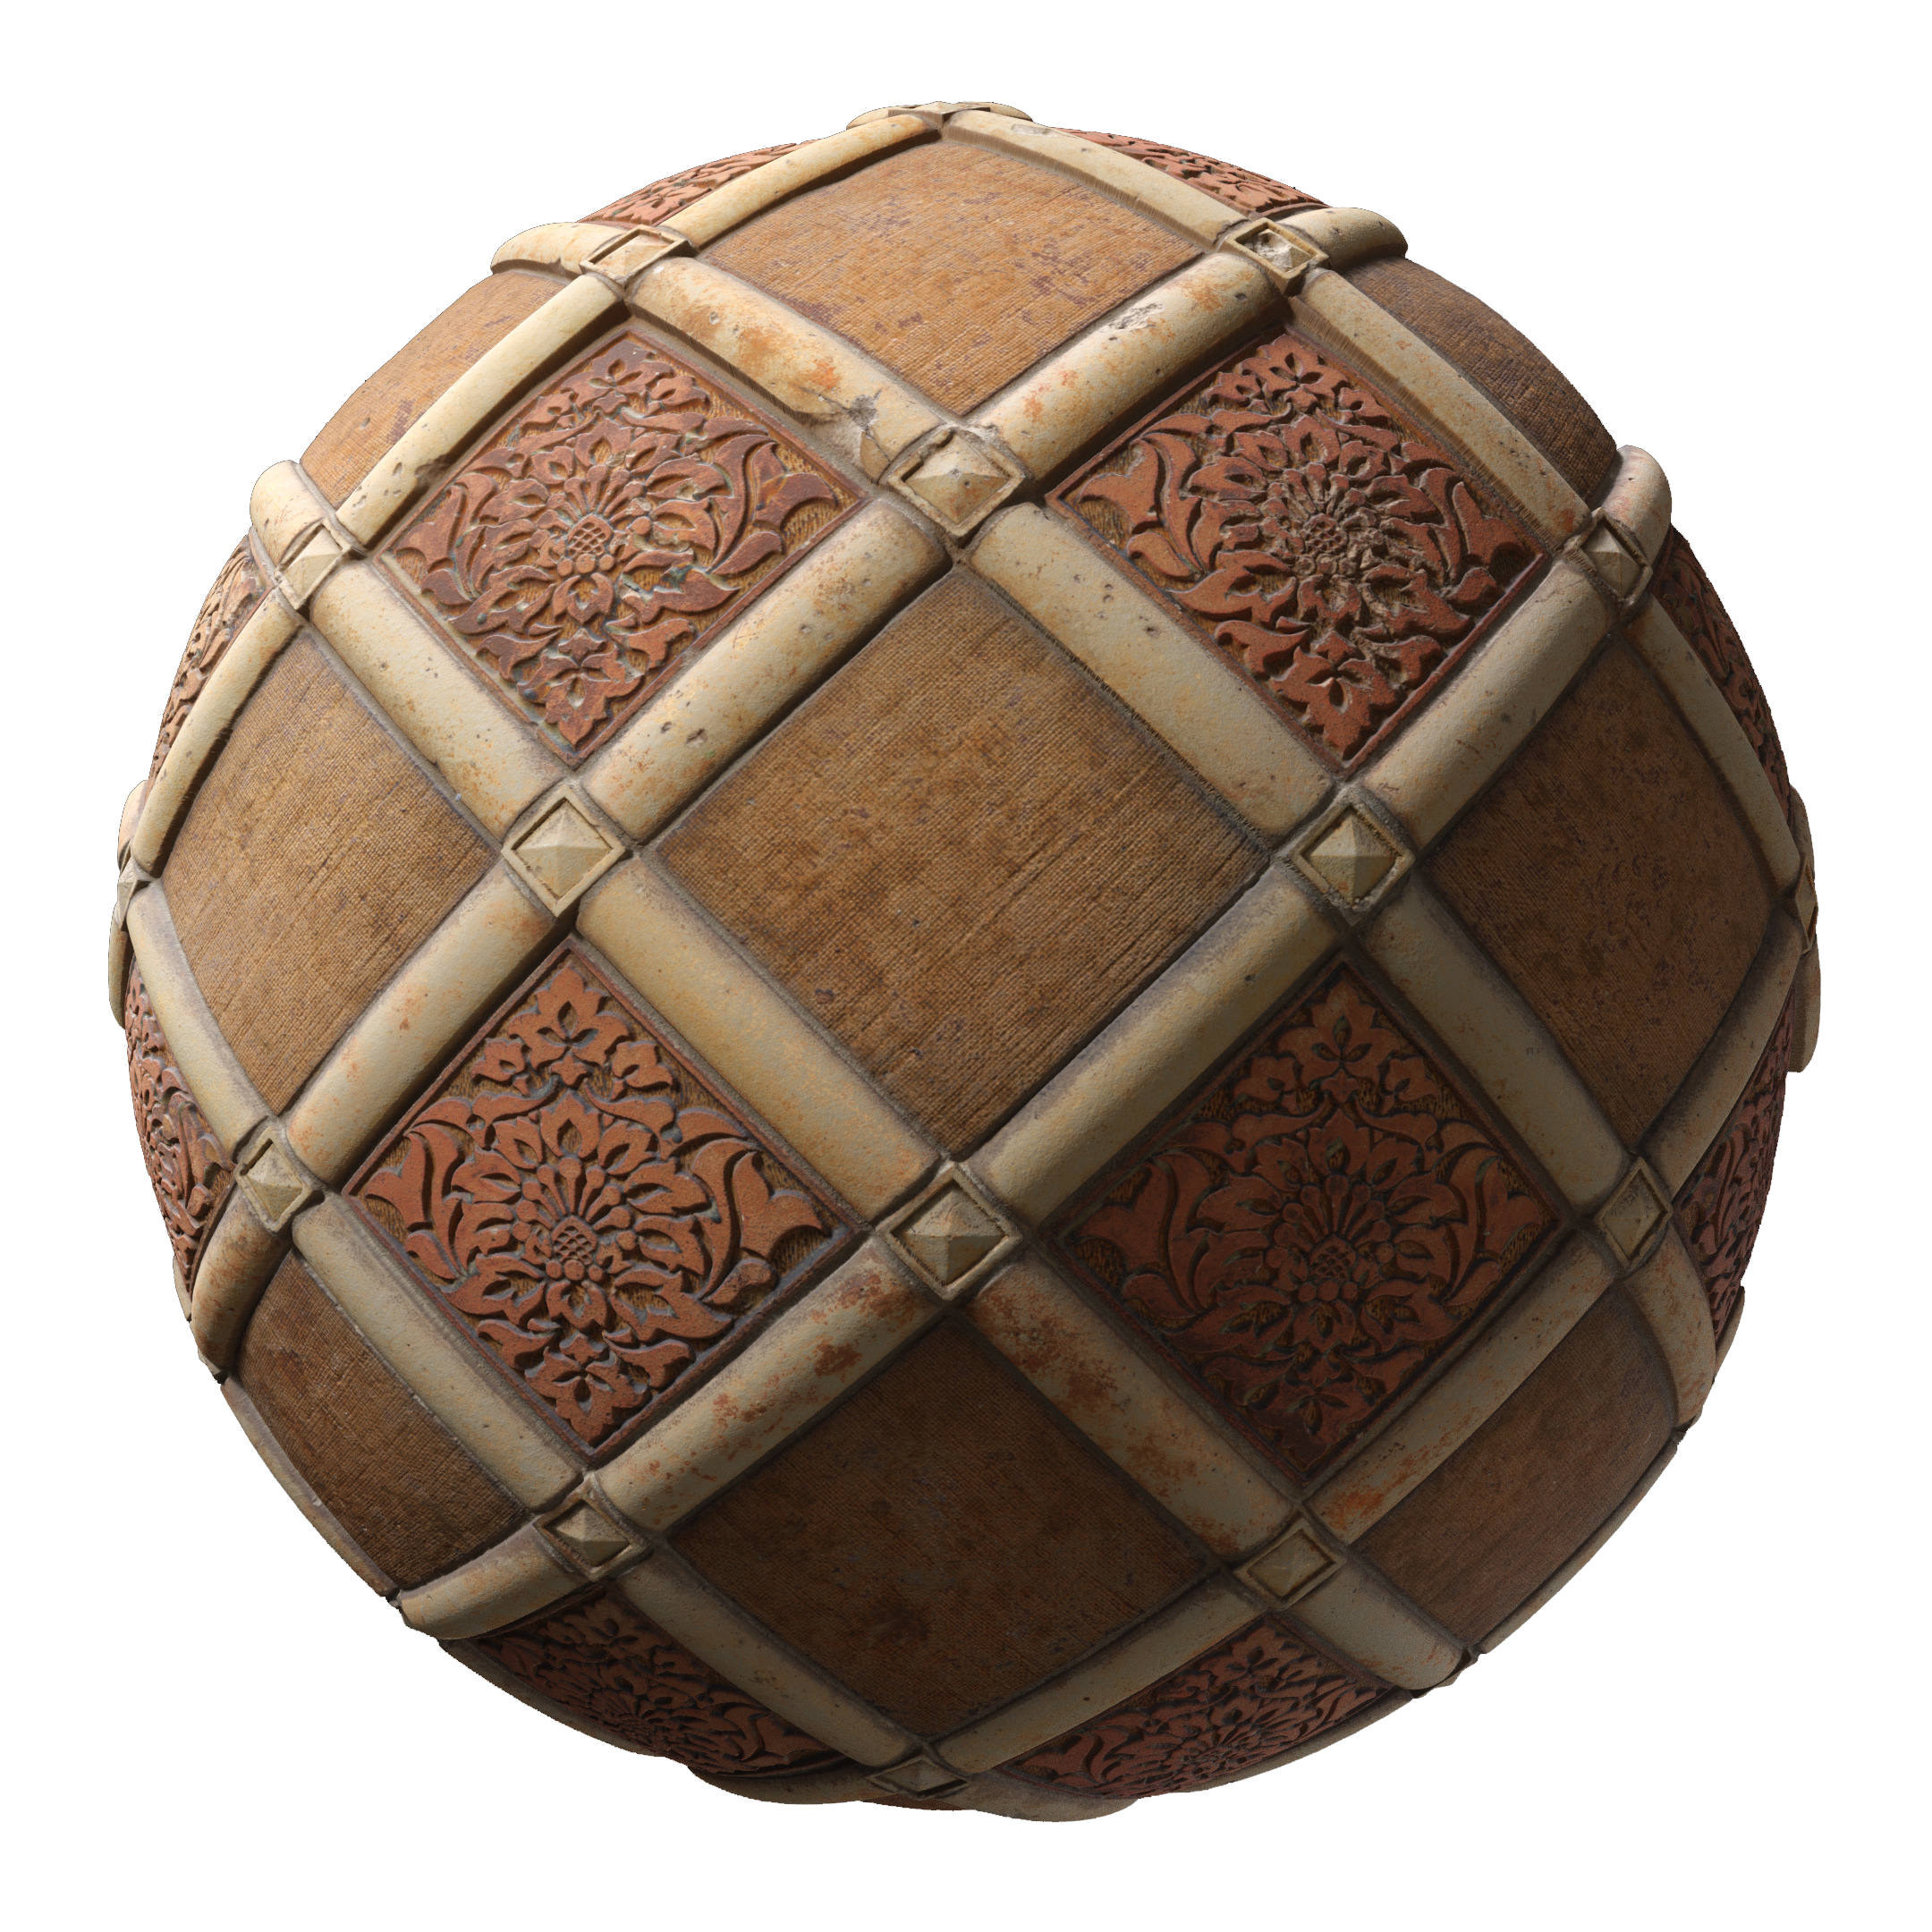 TexturesCom_Ornate_Wall_header4 copy.png